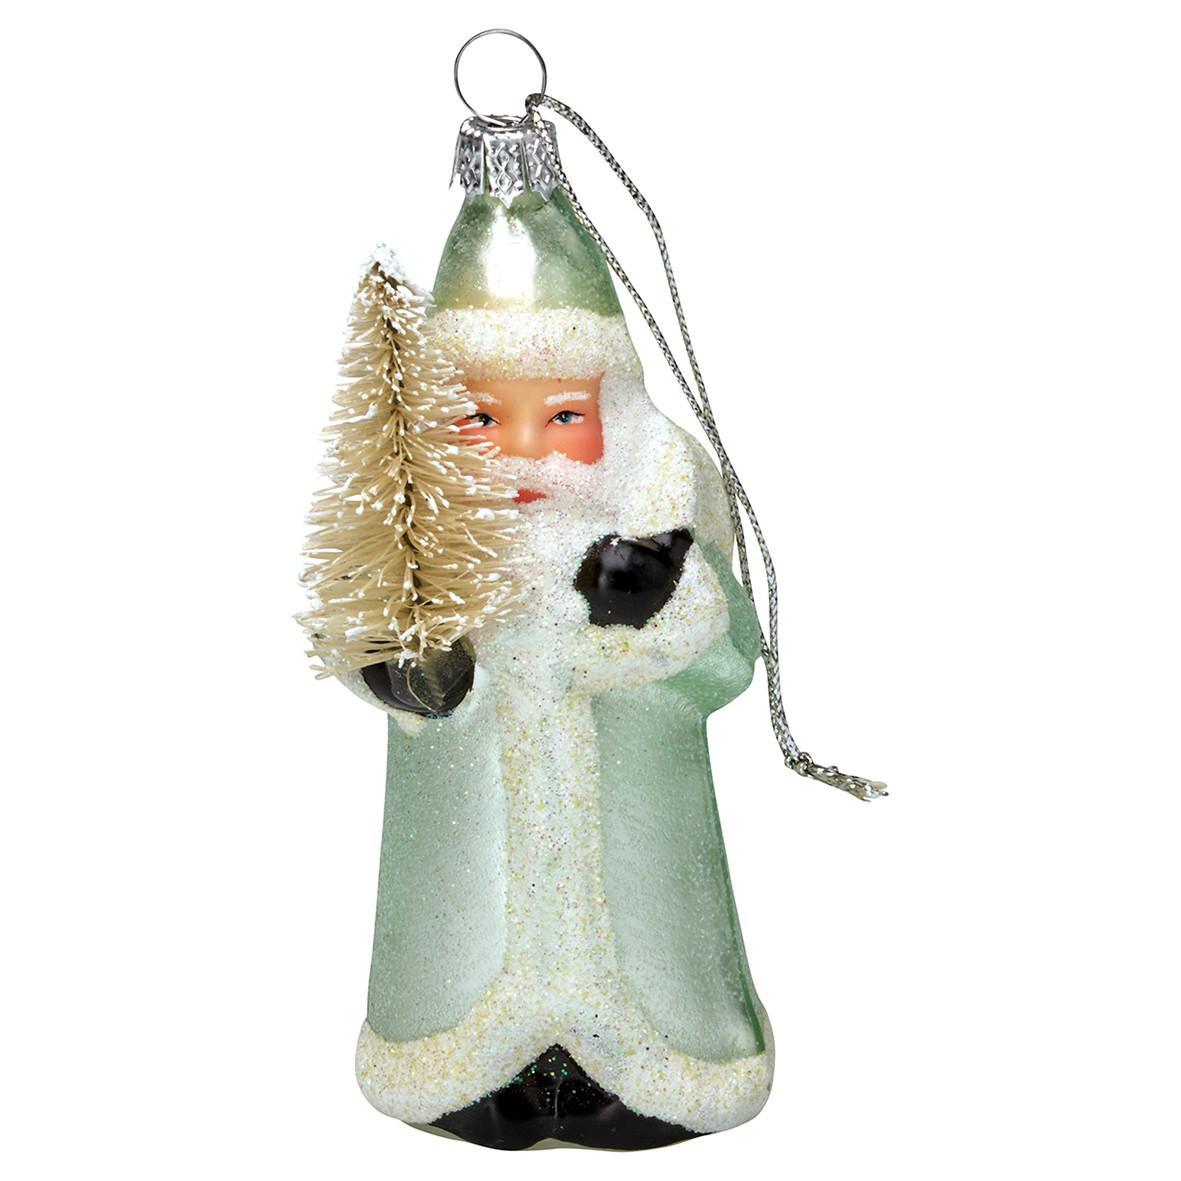 Sias decodreams green gate santa glas mint for Drescher baumschmuck